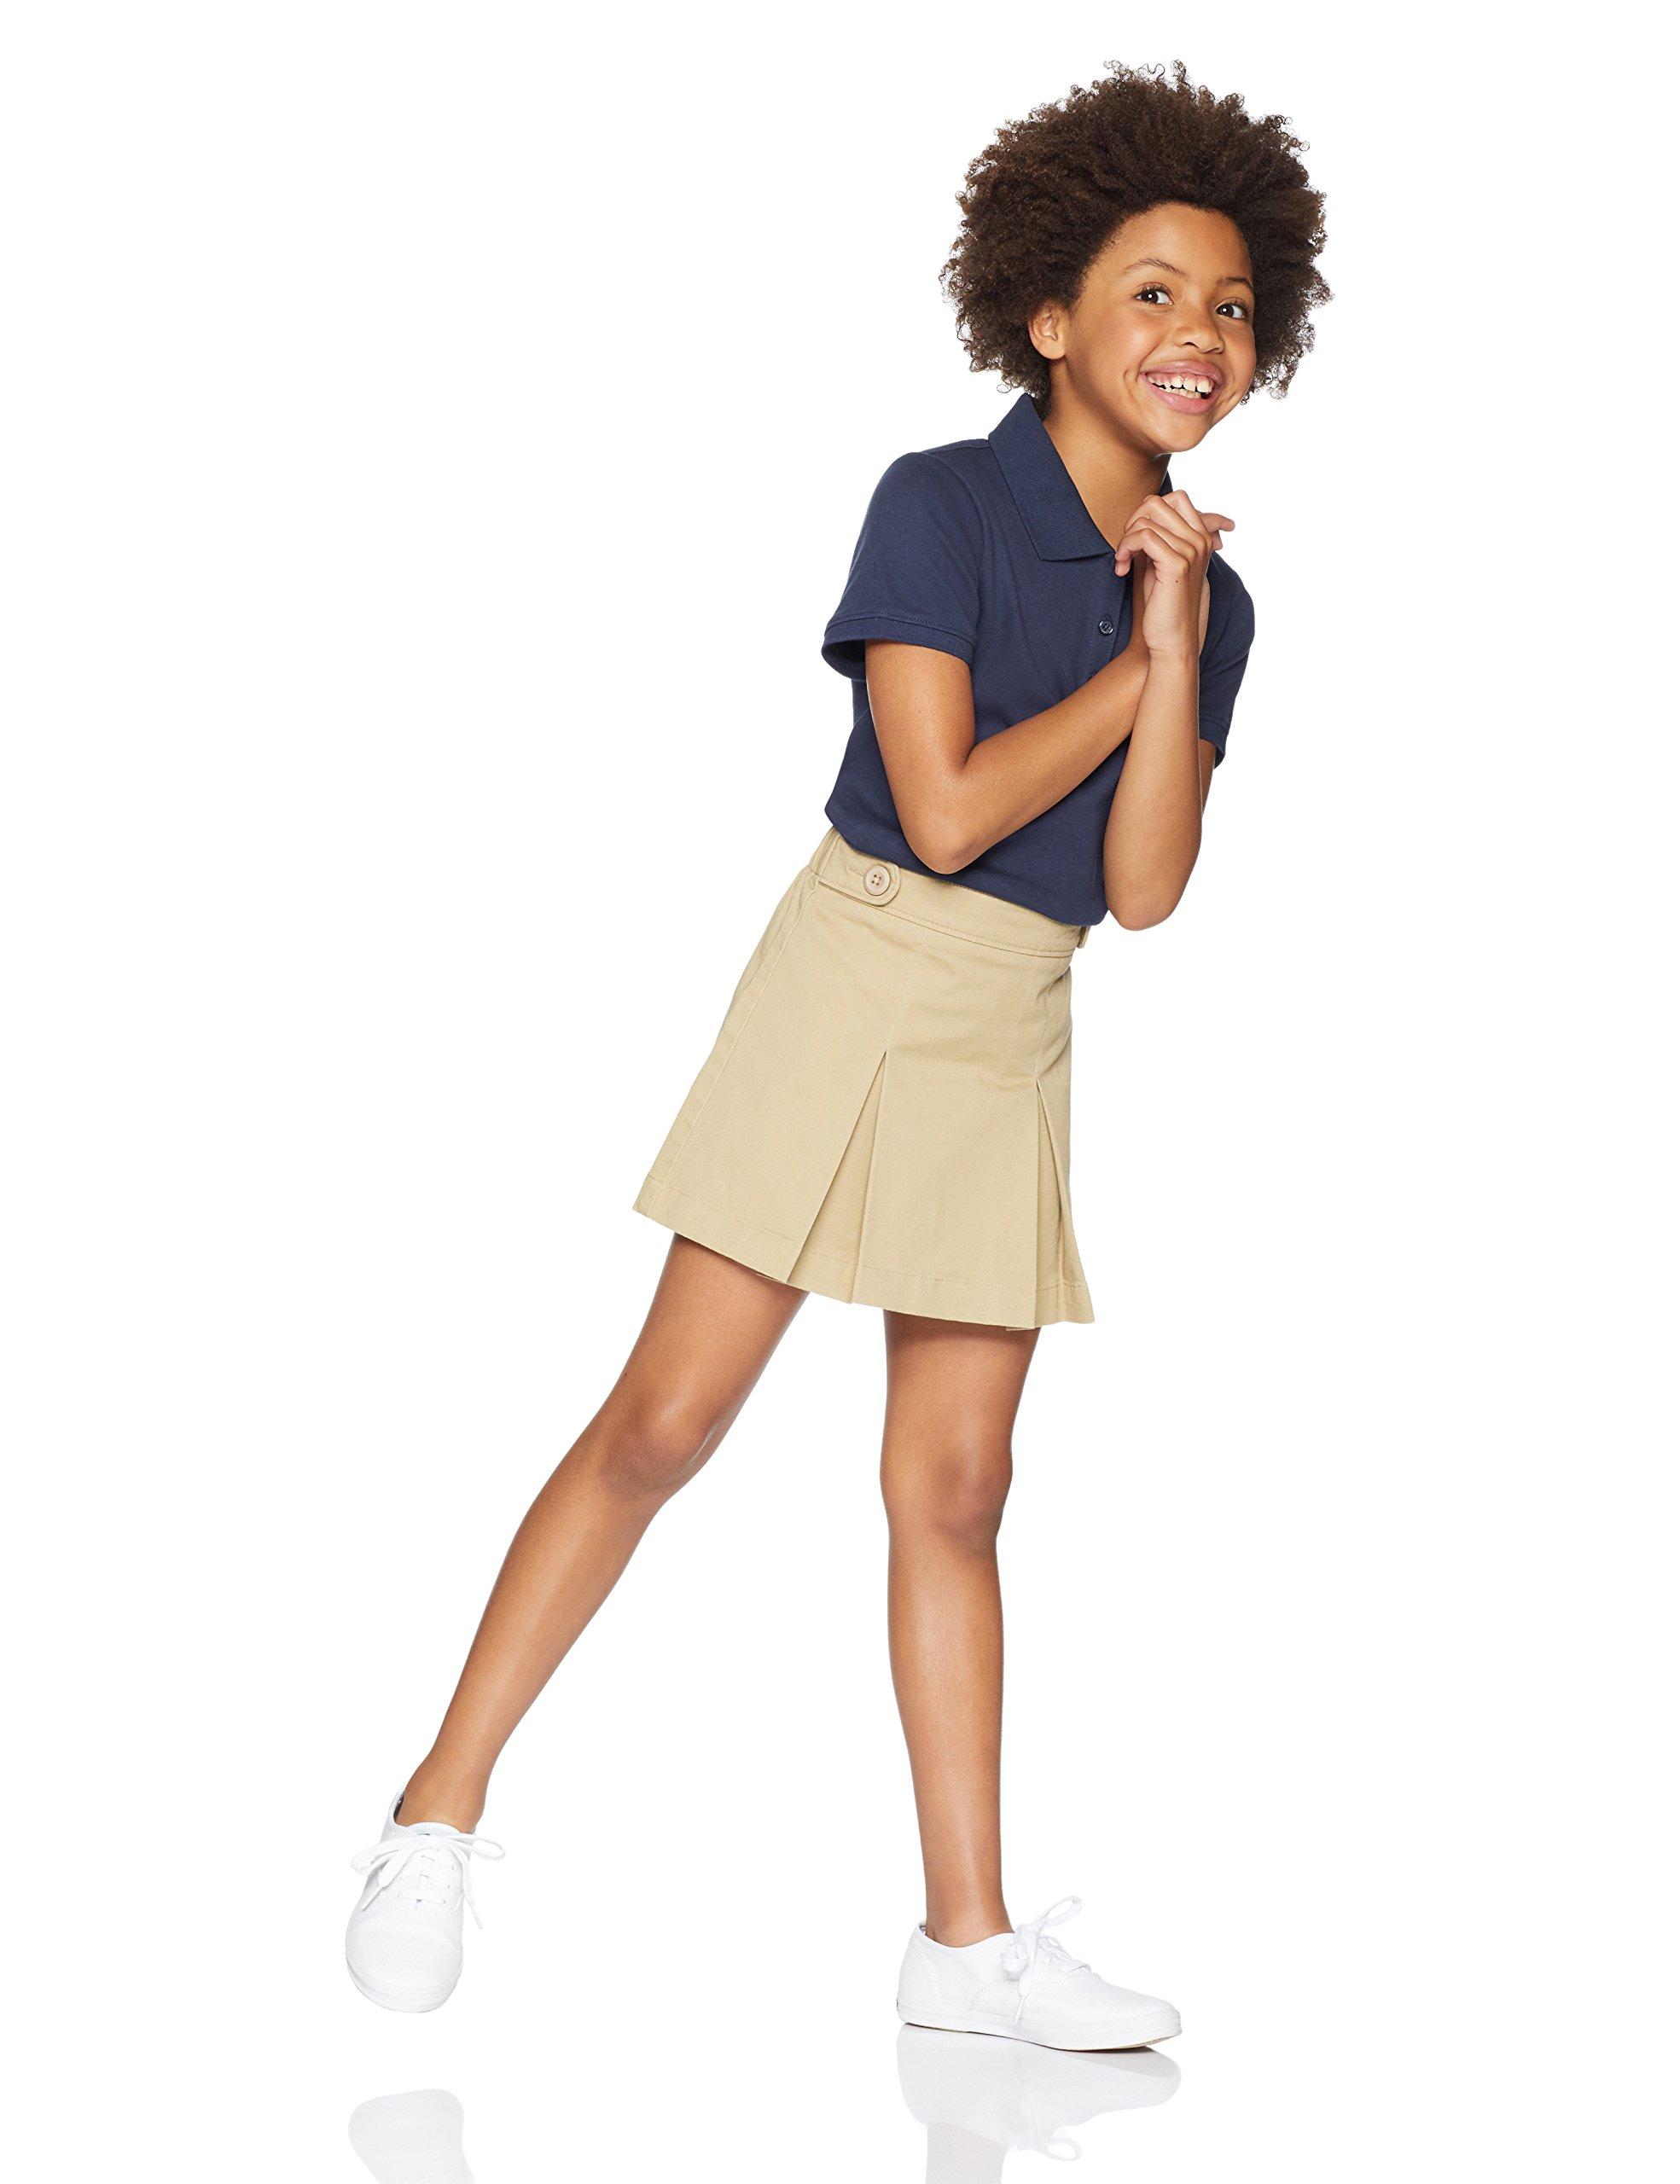 Amazon Essentials Girls' Uniform Skort, Khaki, L (10)